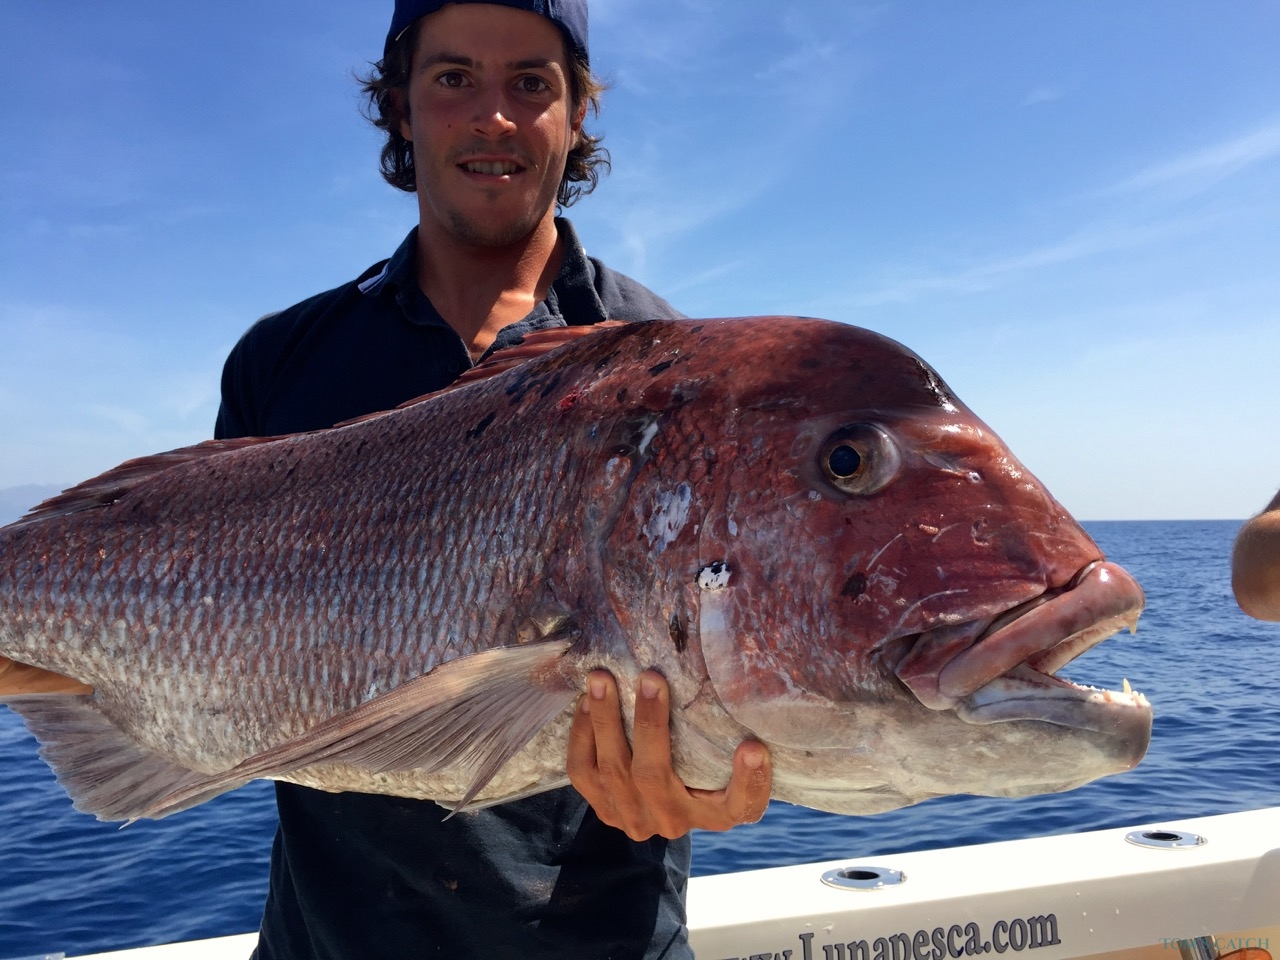 Marbella visgebied